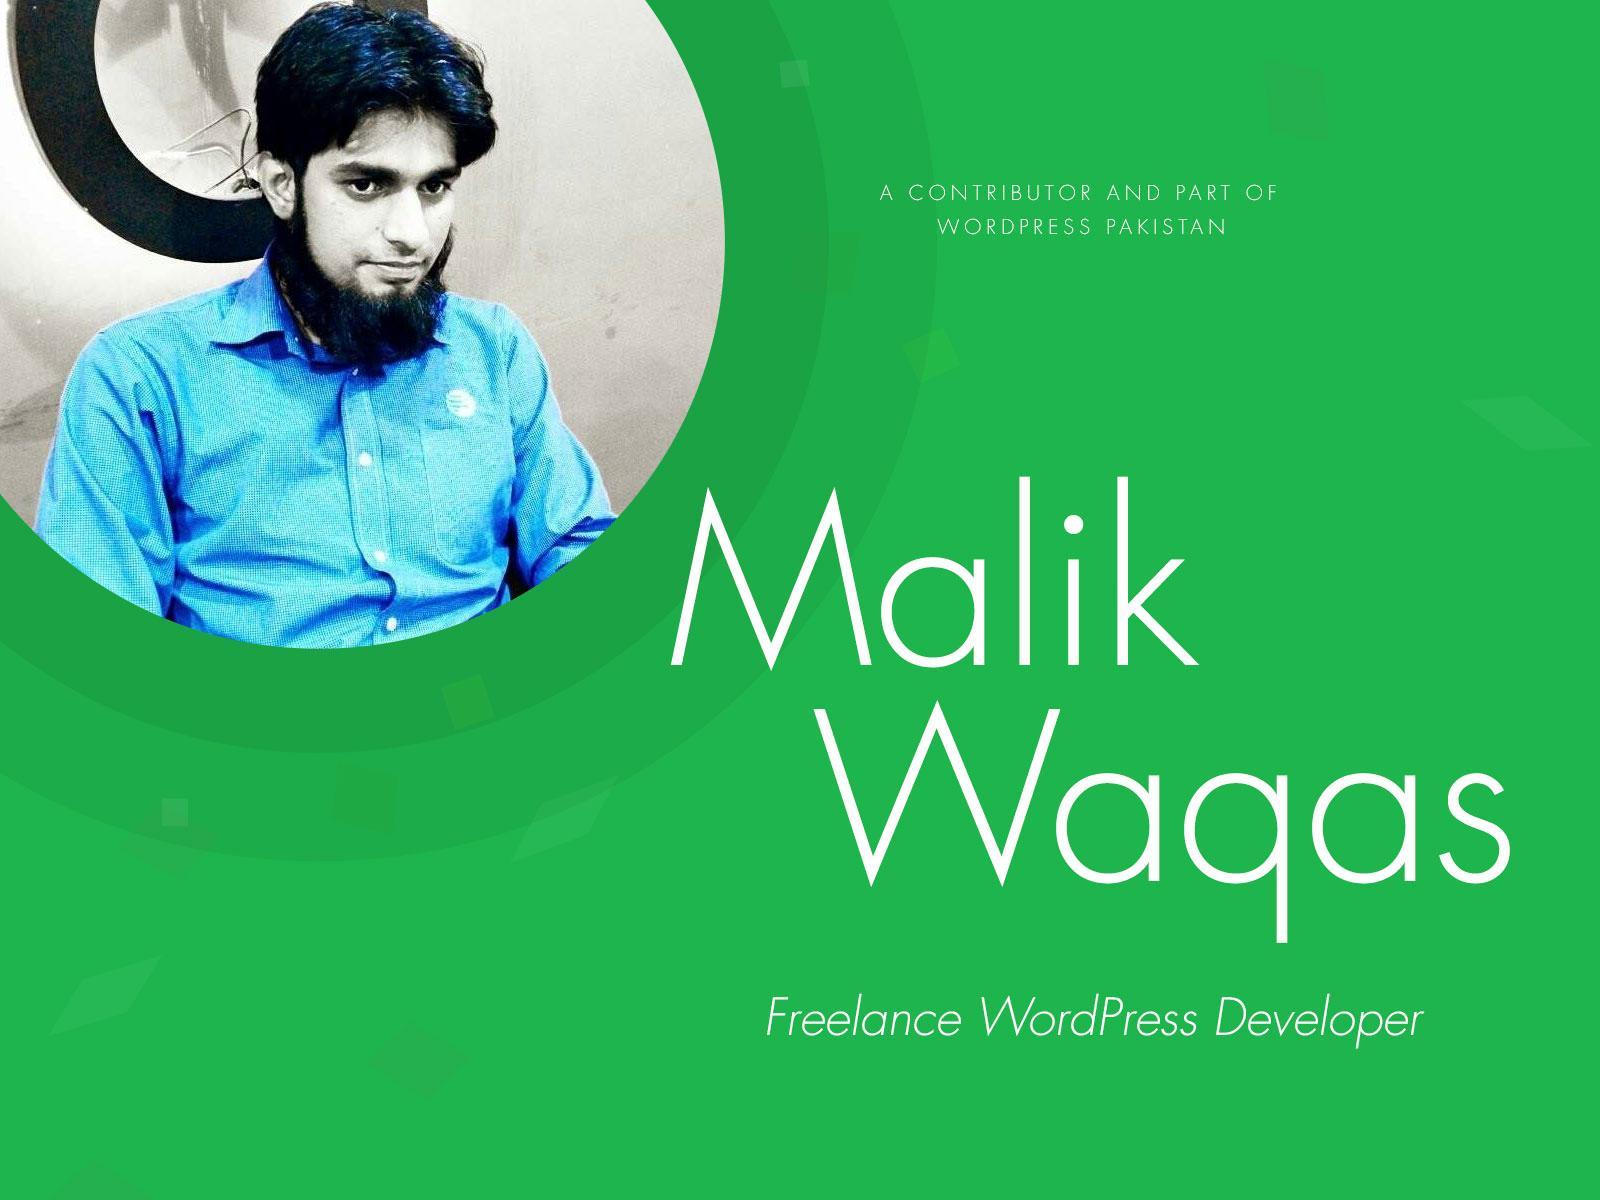 WPPK-malik-waqas-